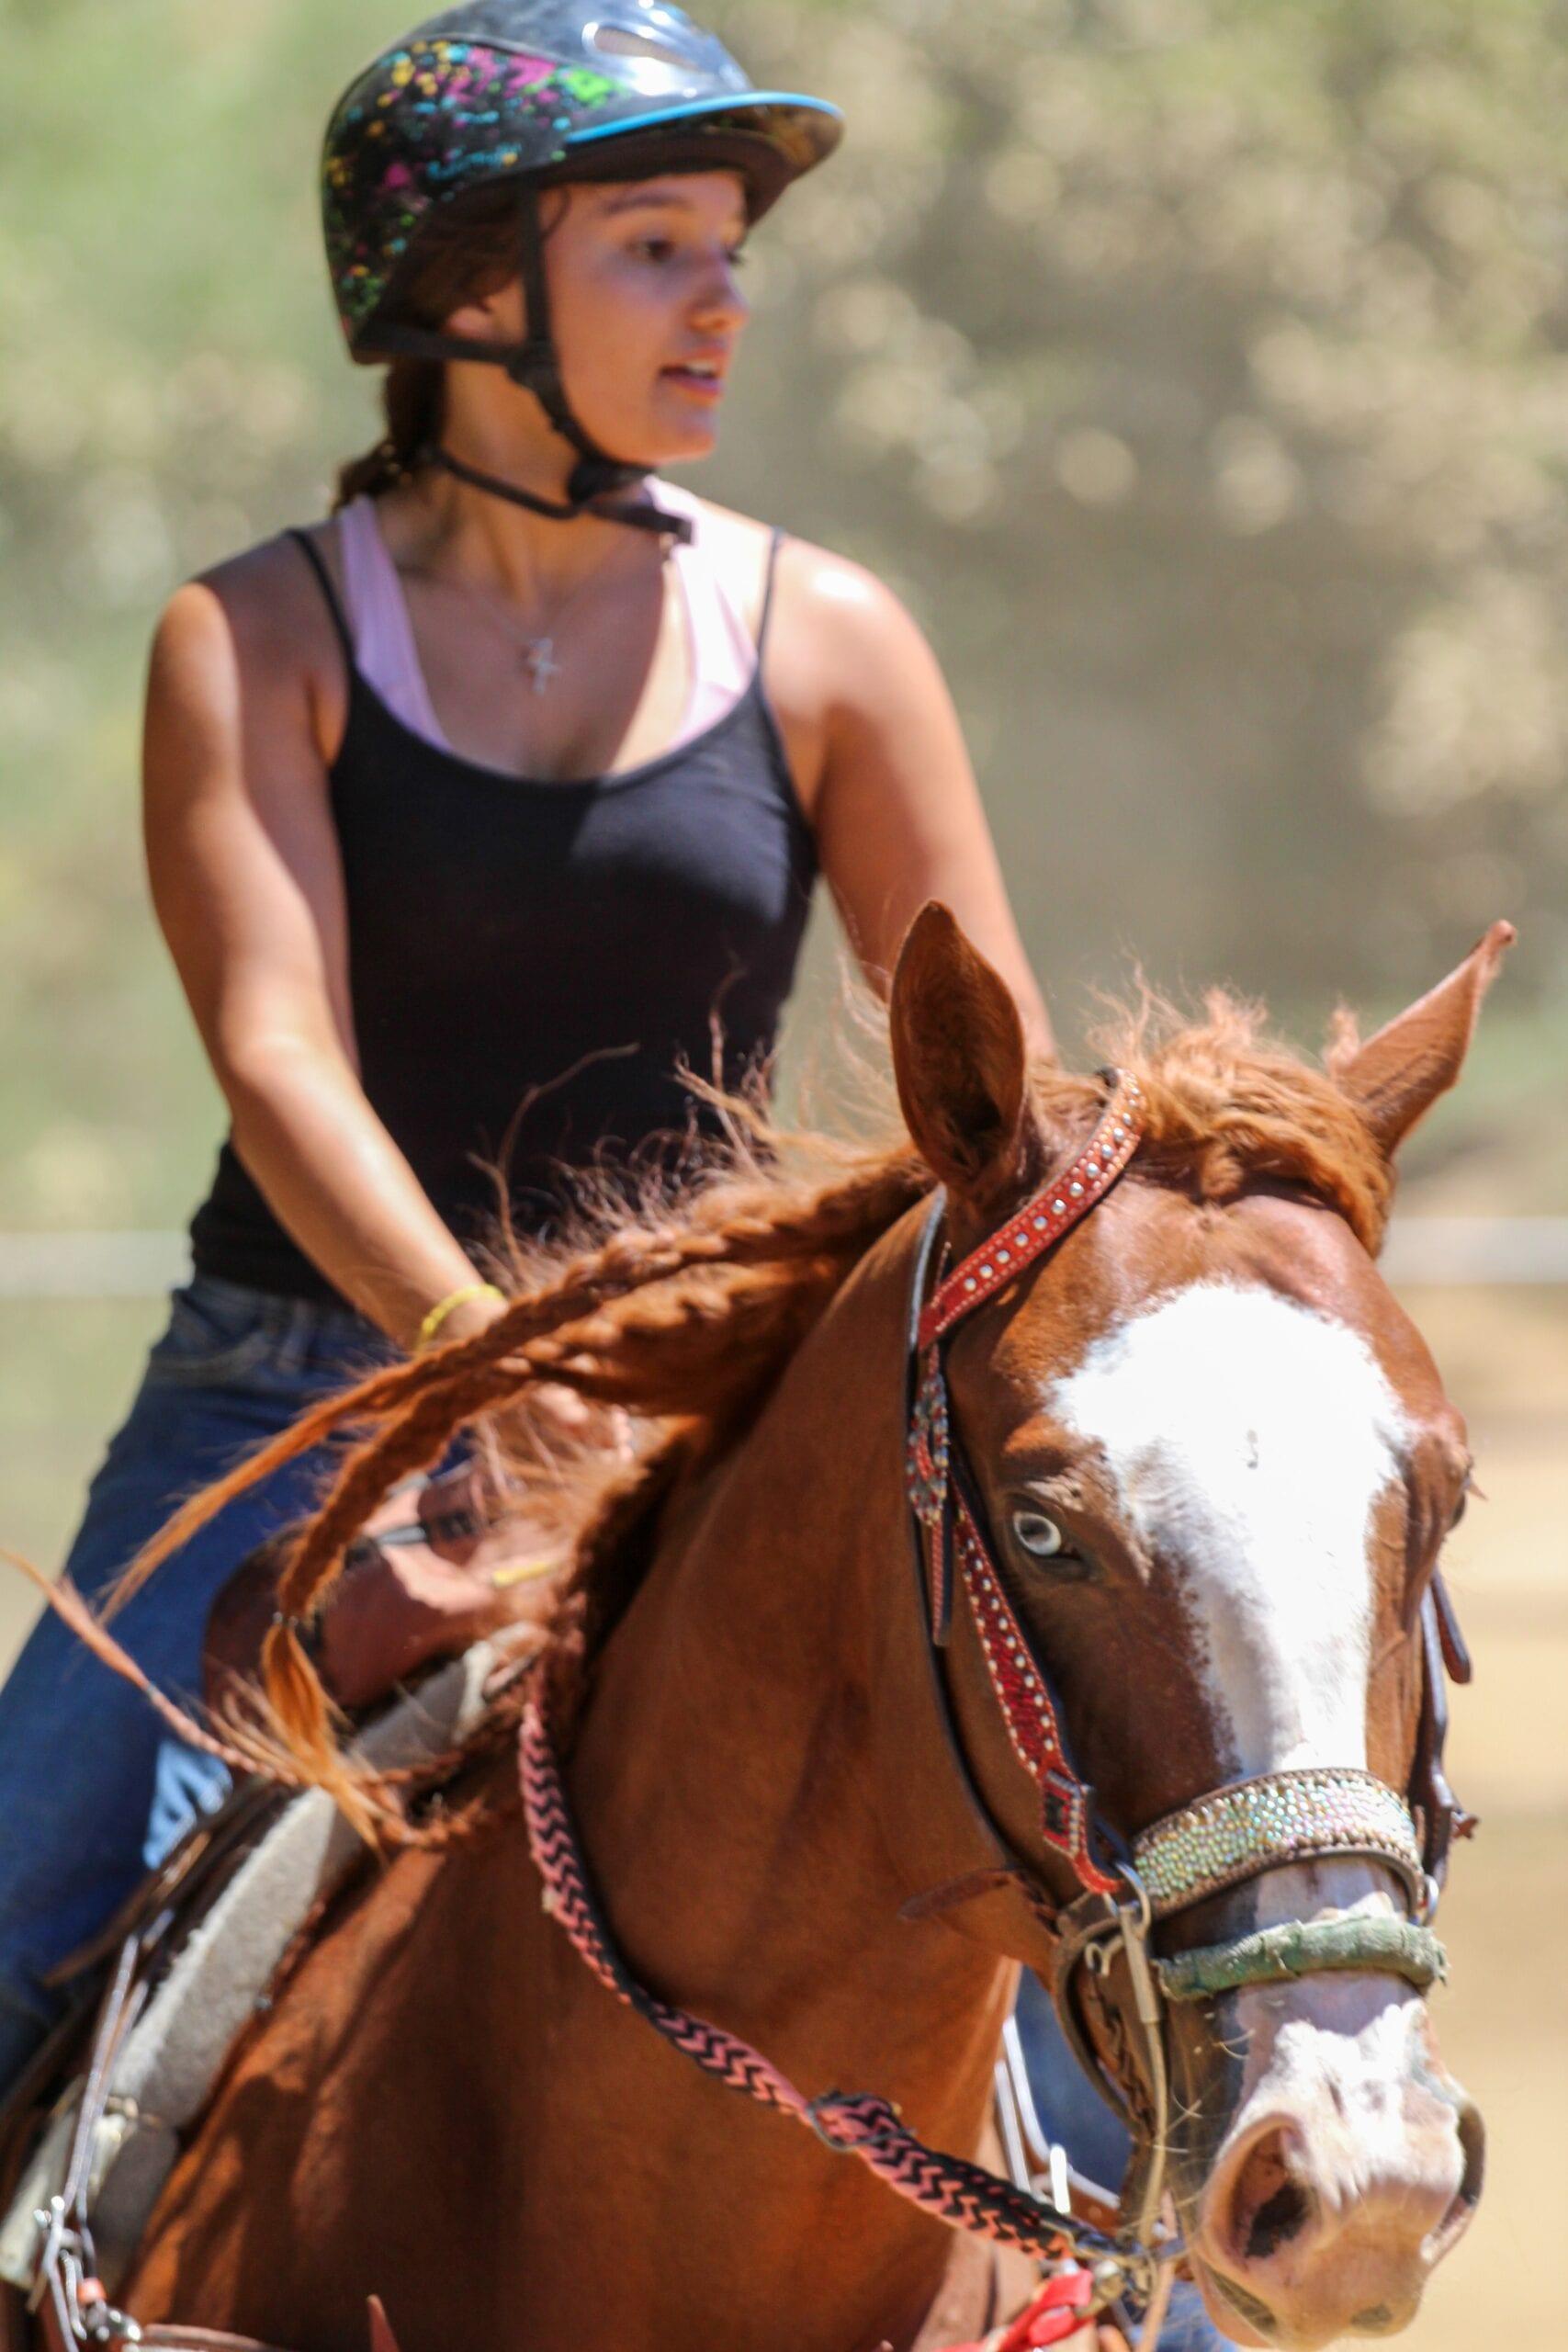 Photo by Christine Benton on Unsplash - Girl on a horse